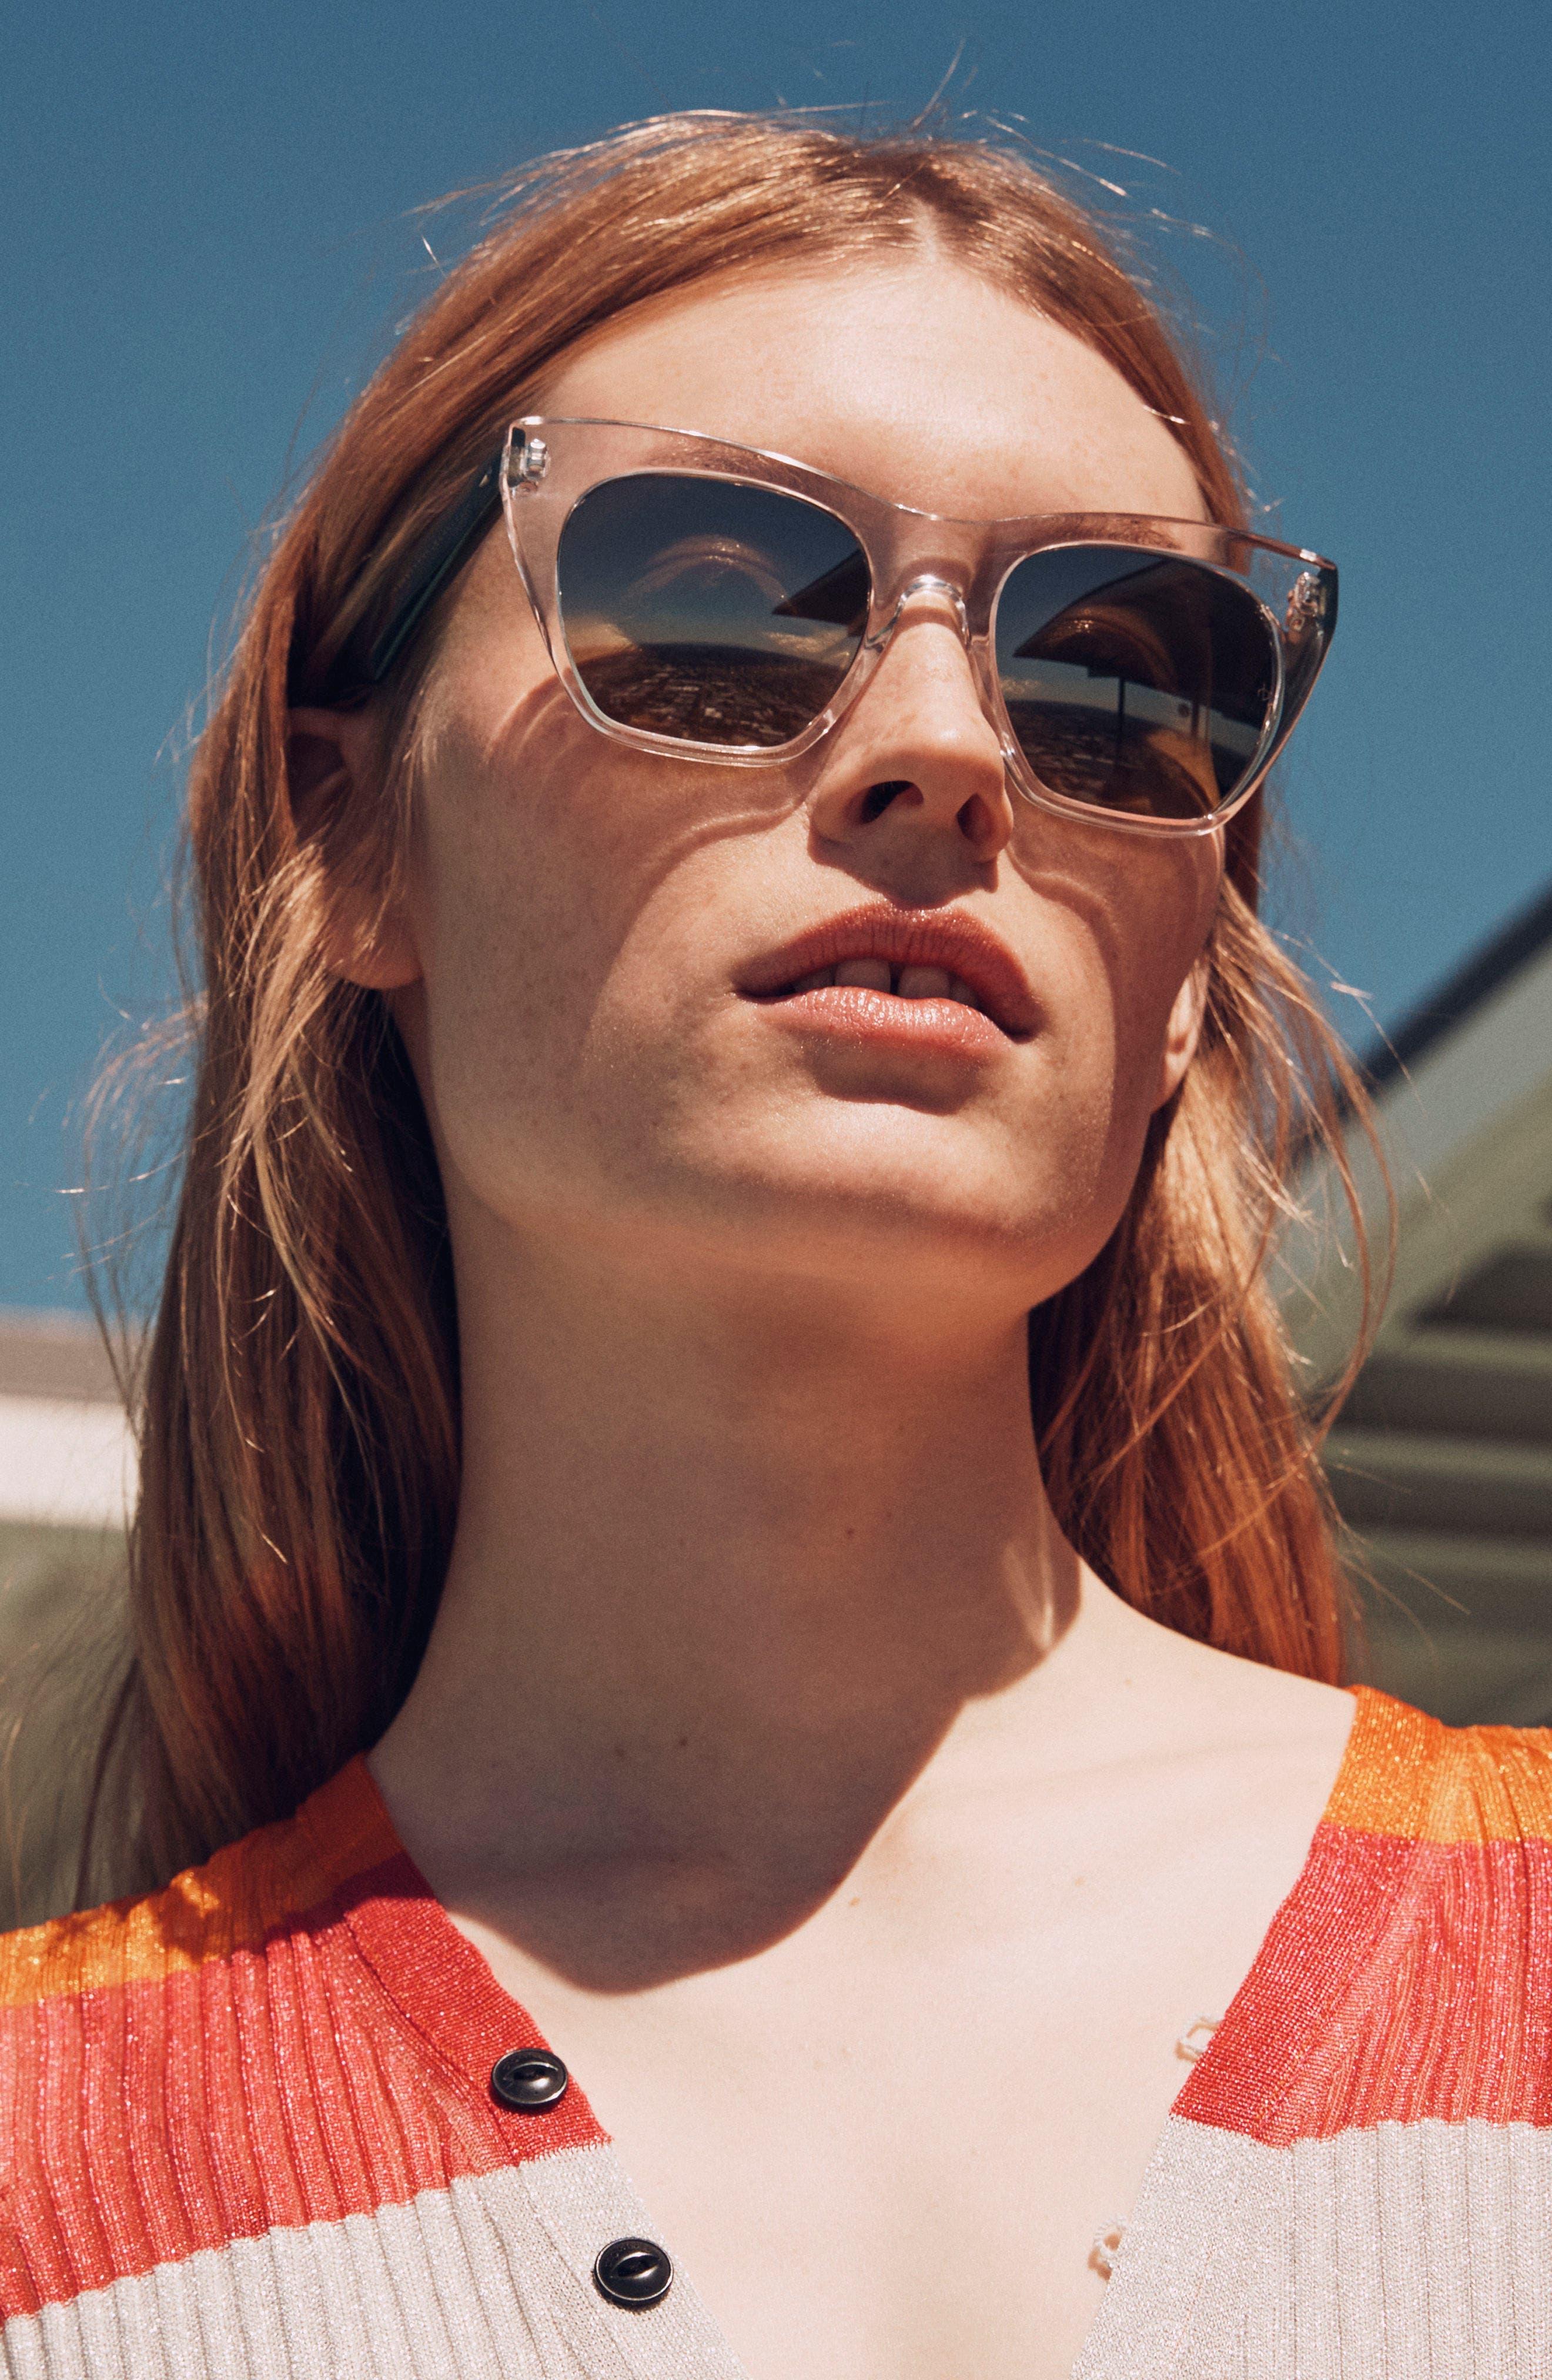 52mm Cat Eye Sunglasses,                             Alternate thumbnail 5, color,                             BLACK/ BLUE